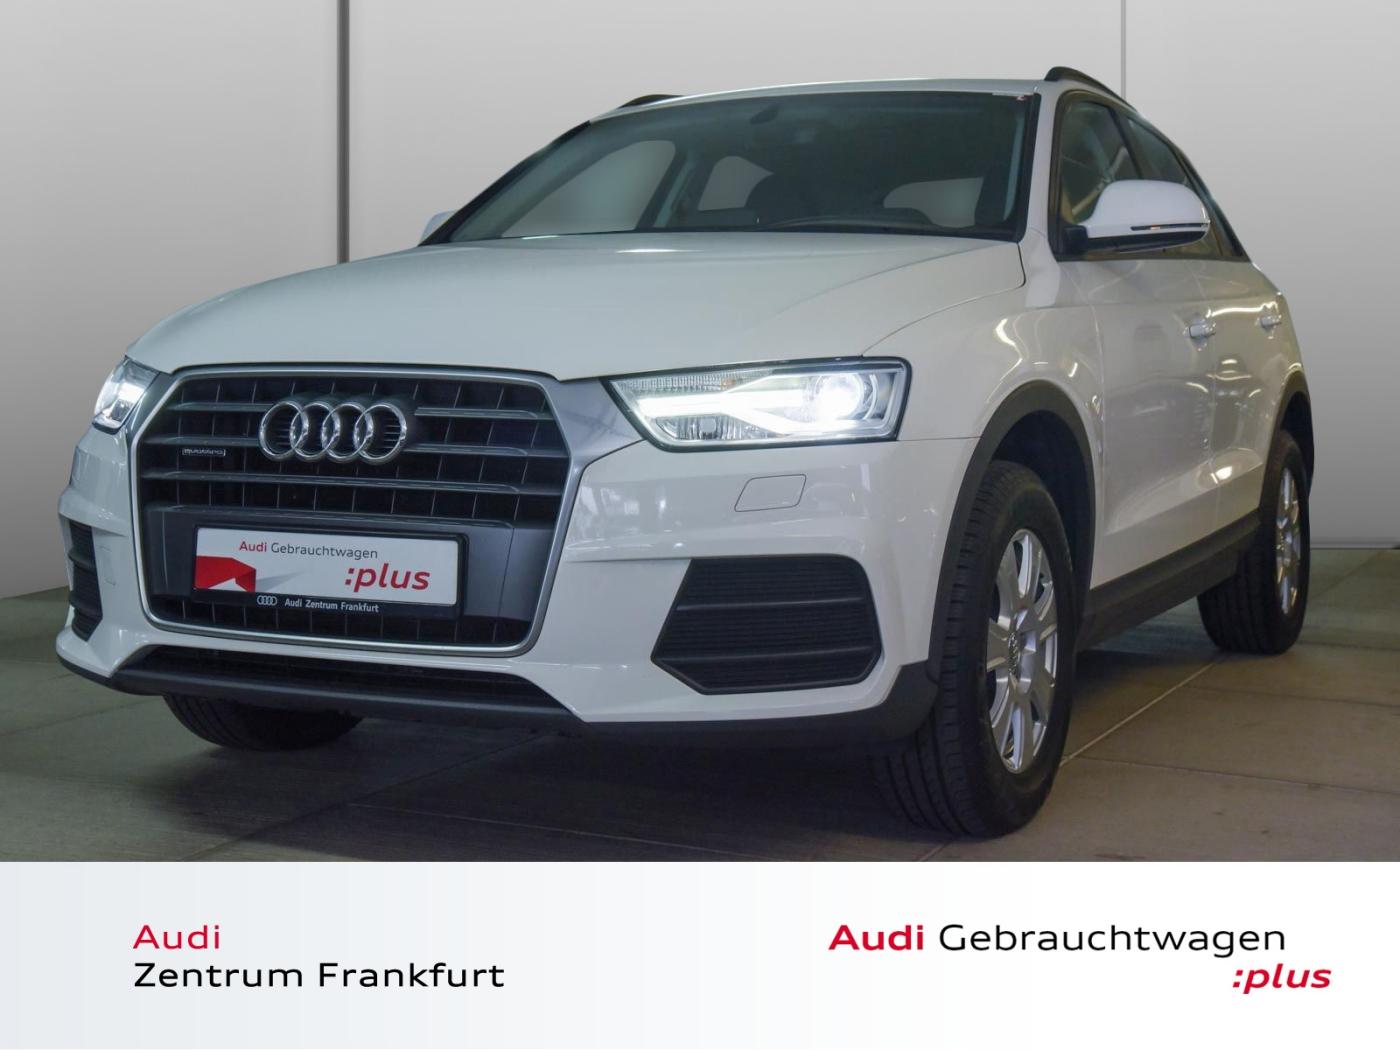 Audi Q3 2.0 TDI quattro BOSE Xenon PDC Tempomat Bluet, Jahr 2017, Diesel